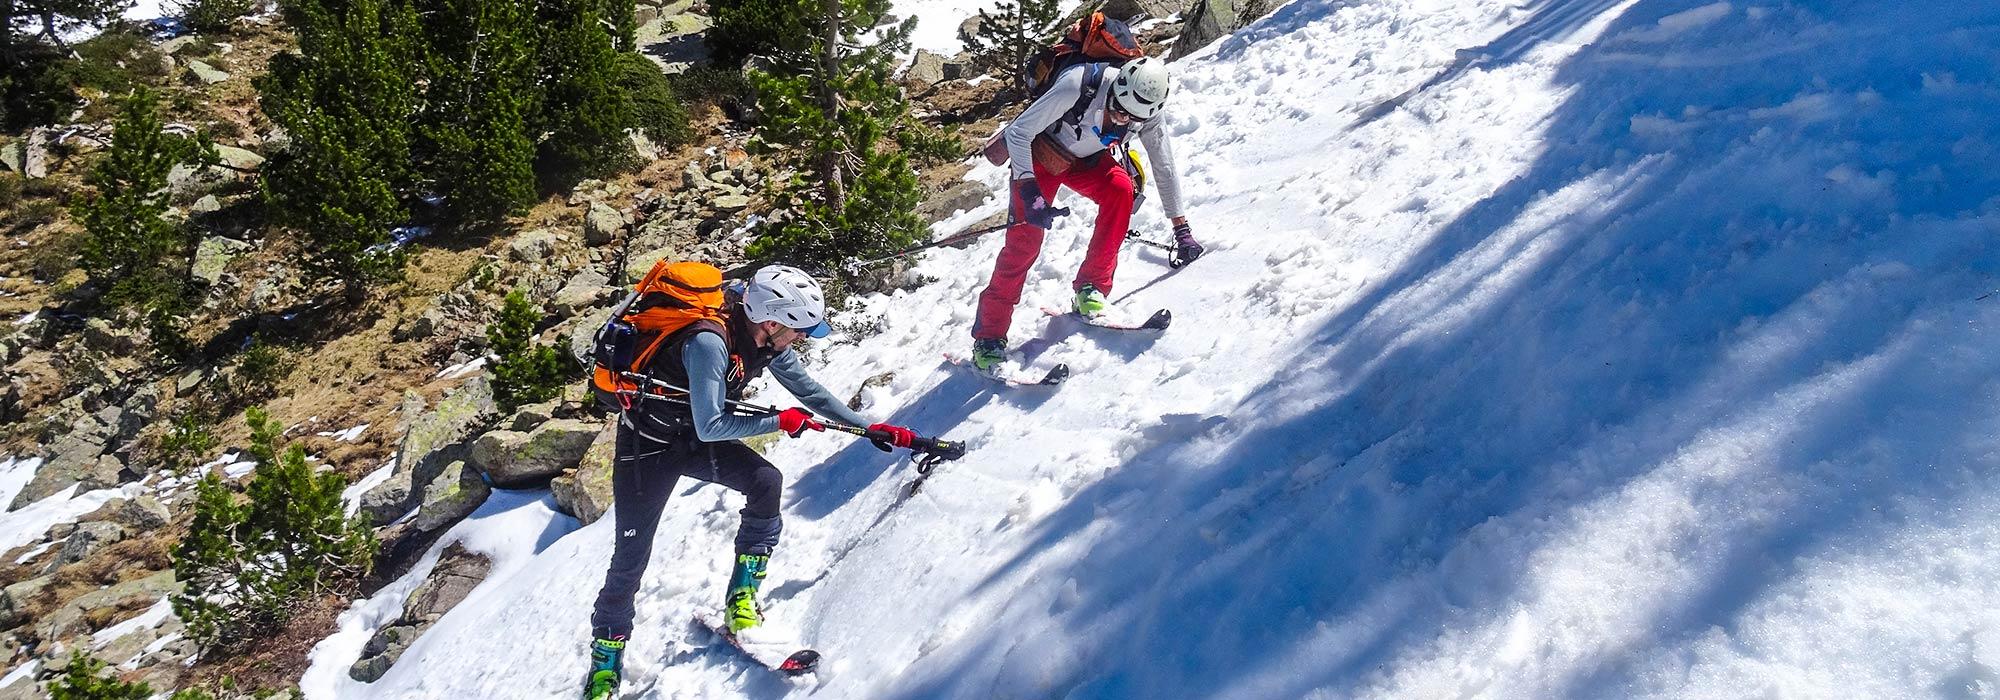 Esquí de montaña. Progresión en tijera